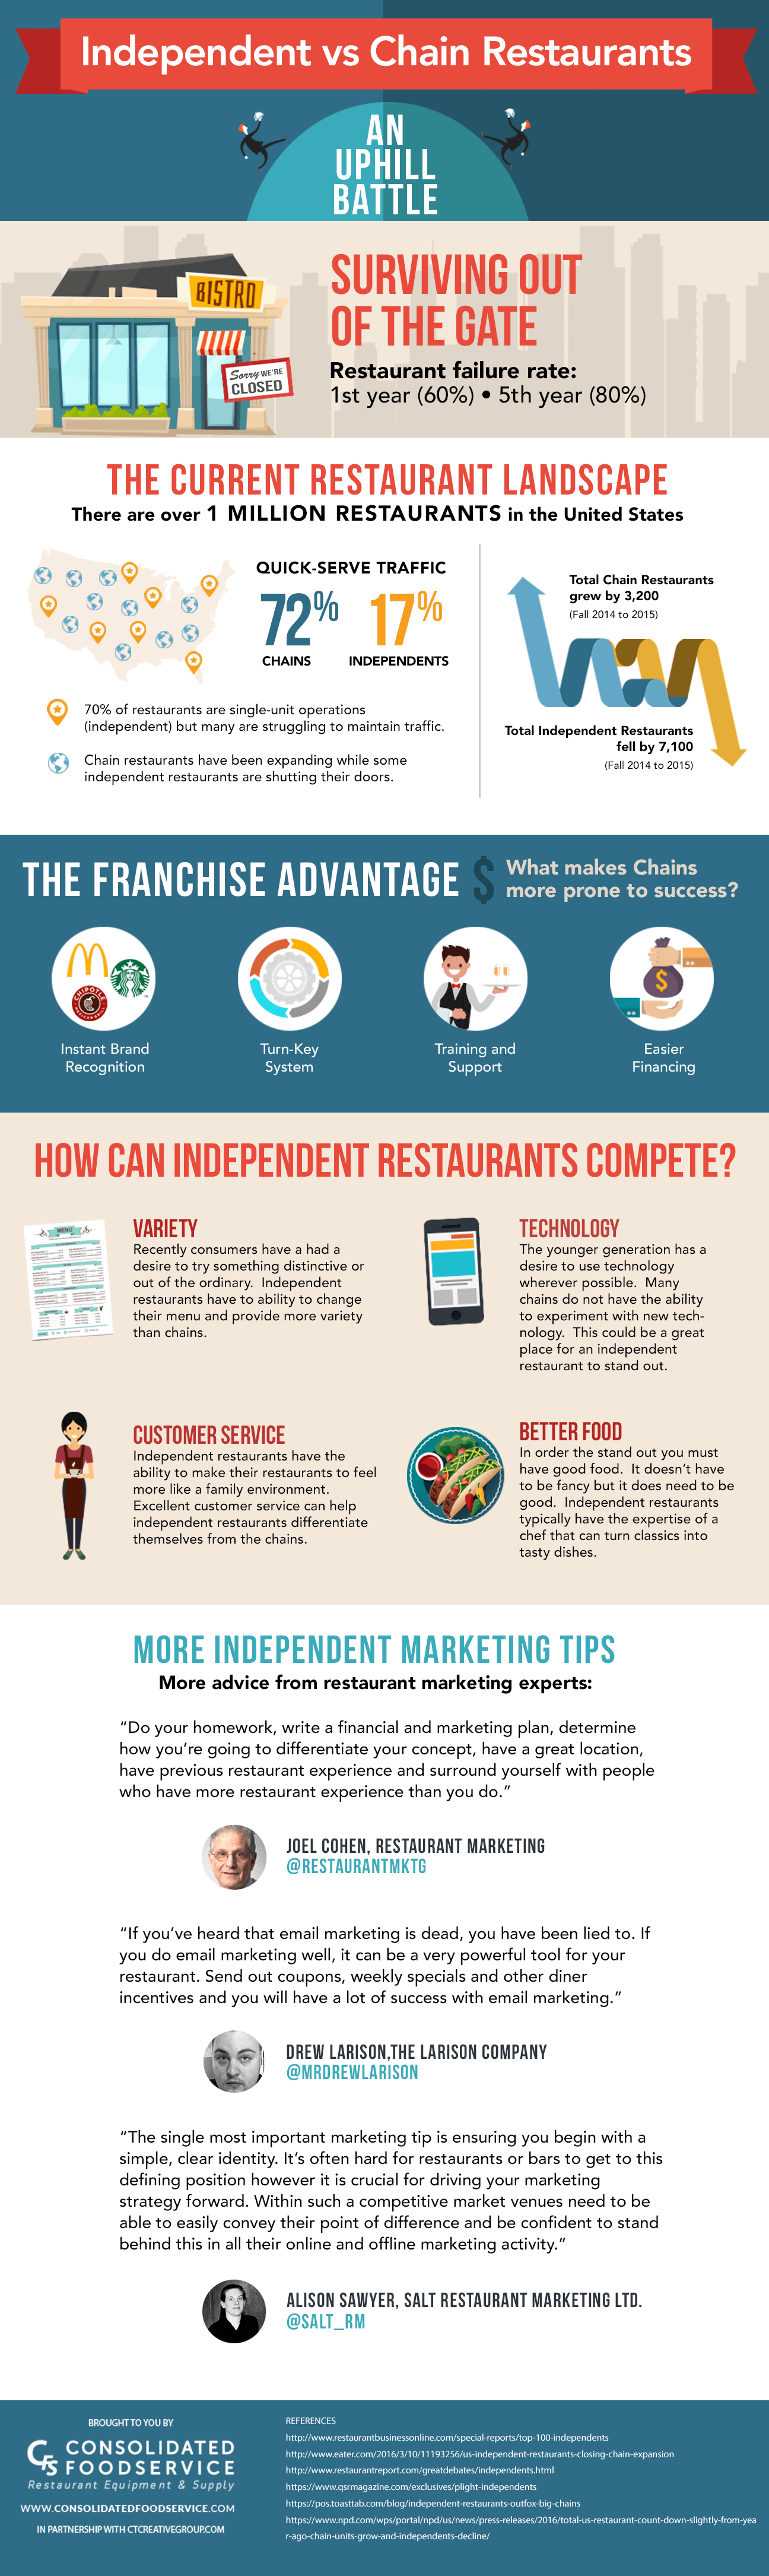 Independent vs Chain Restaurants Infographic